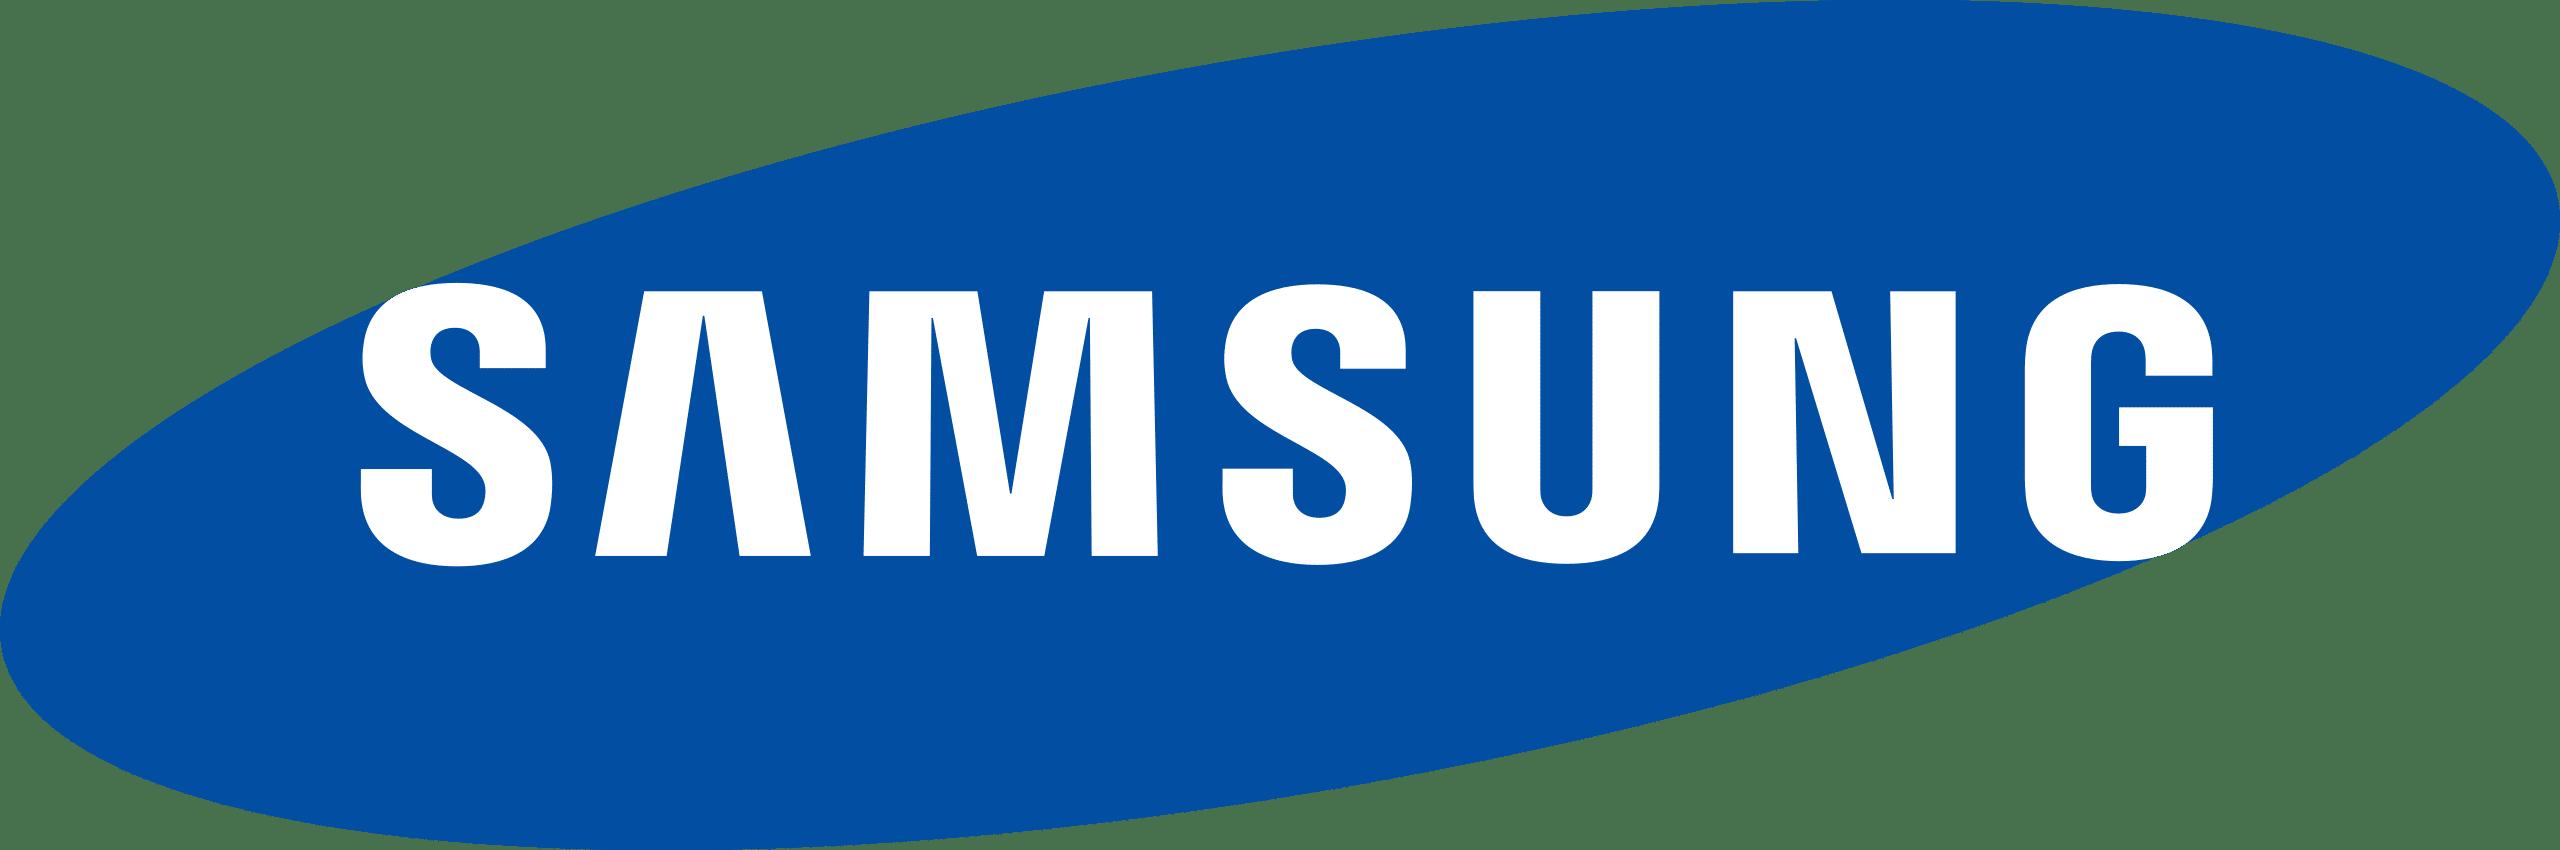 Galaxy S21 | S21+ | S21 Ultra 5G – Samsung